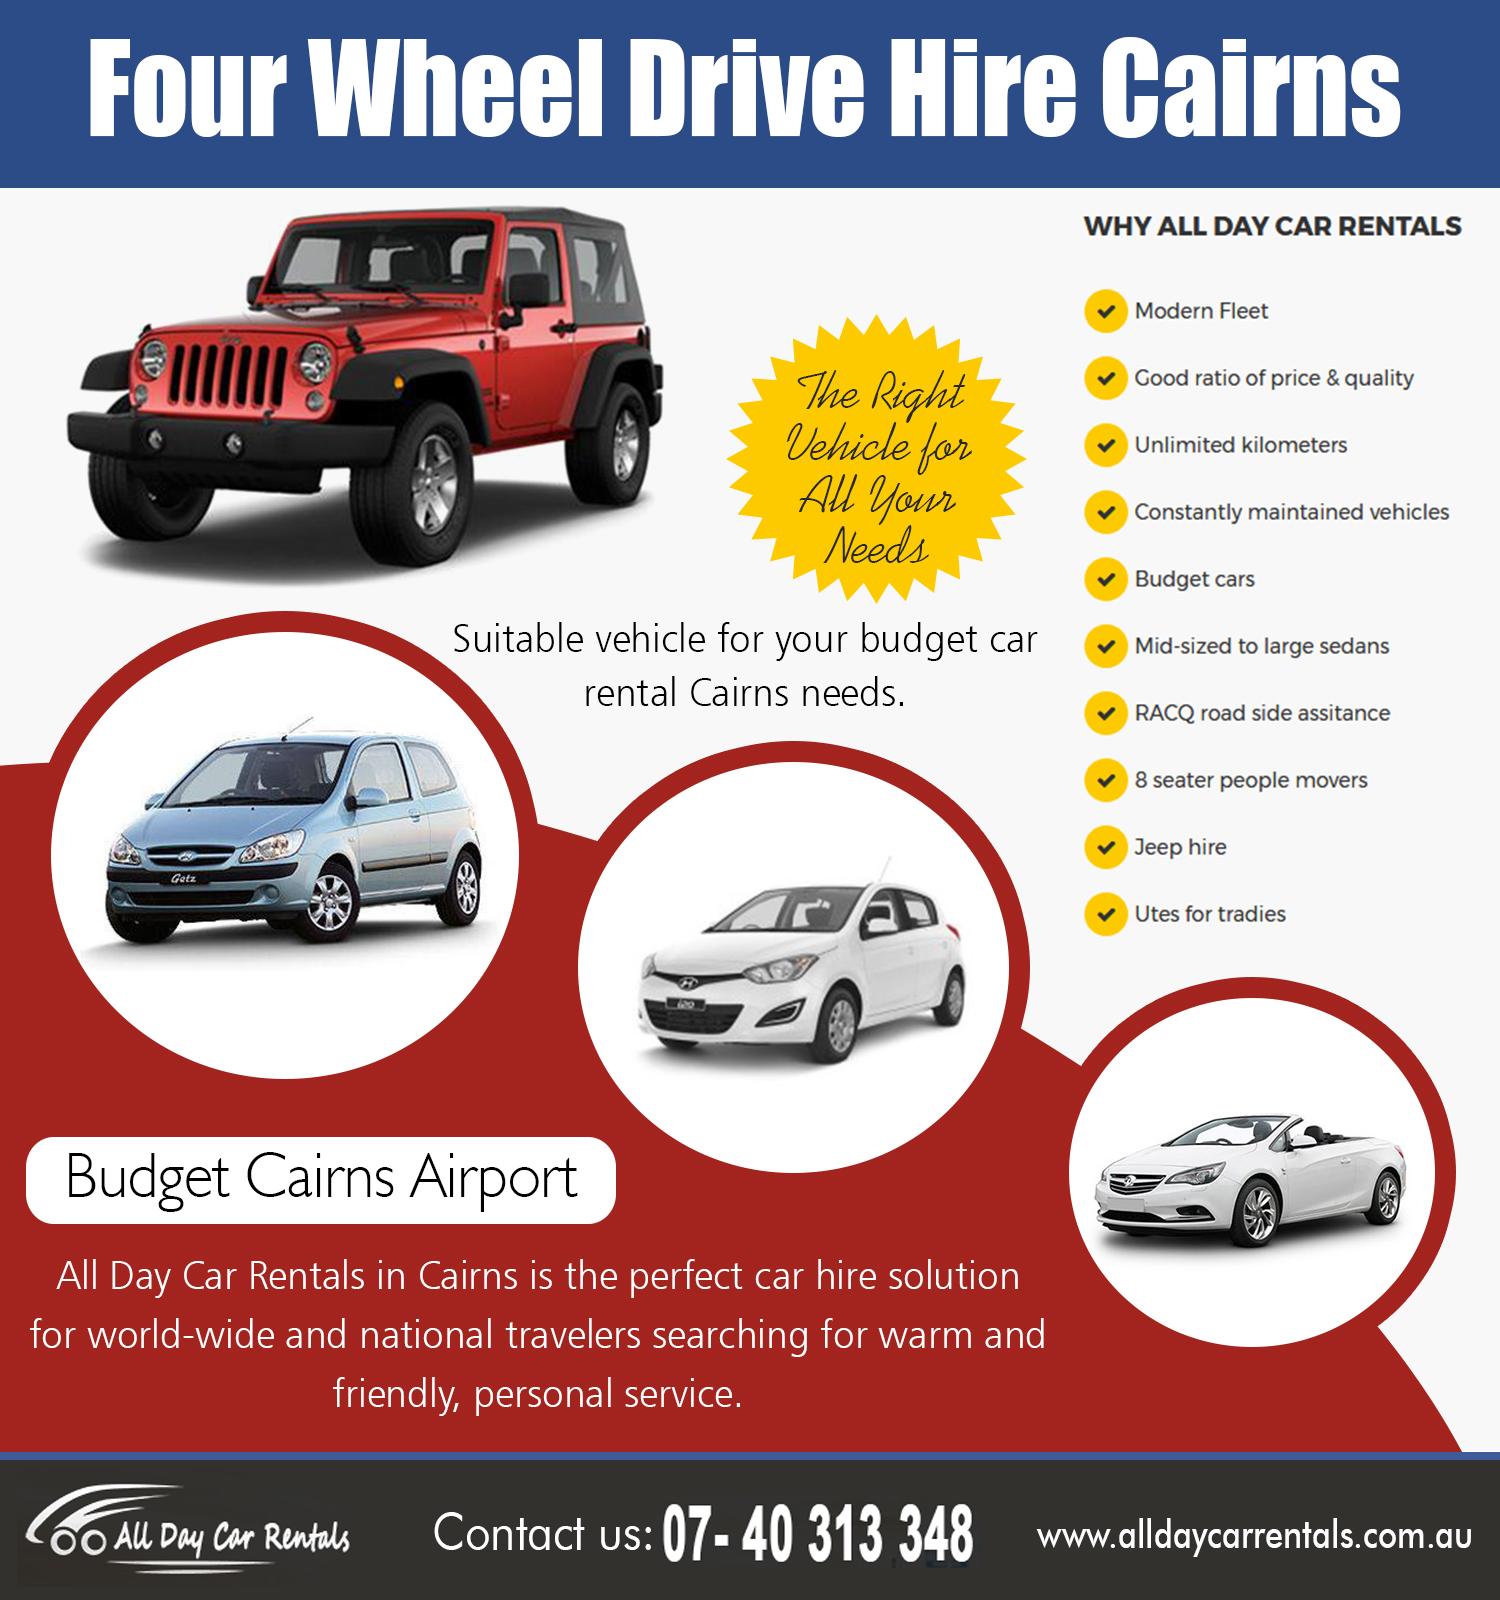 Four Wheel Drive Hire Cairns